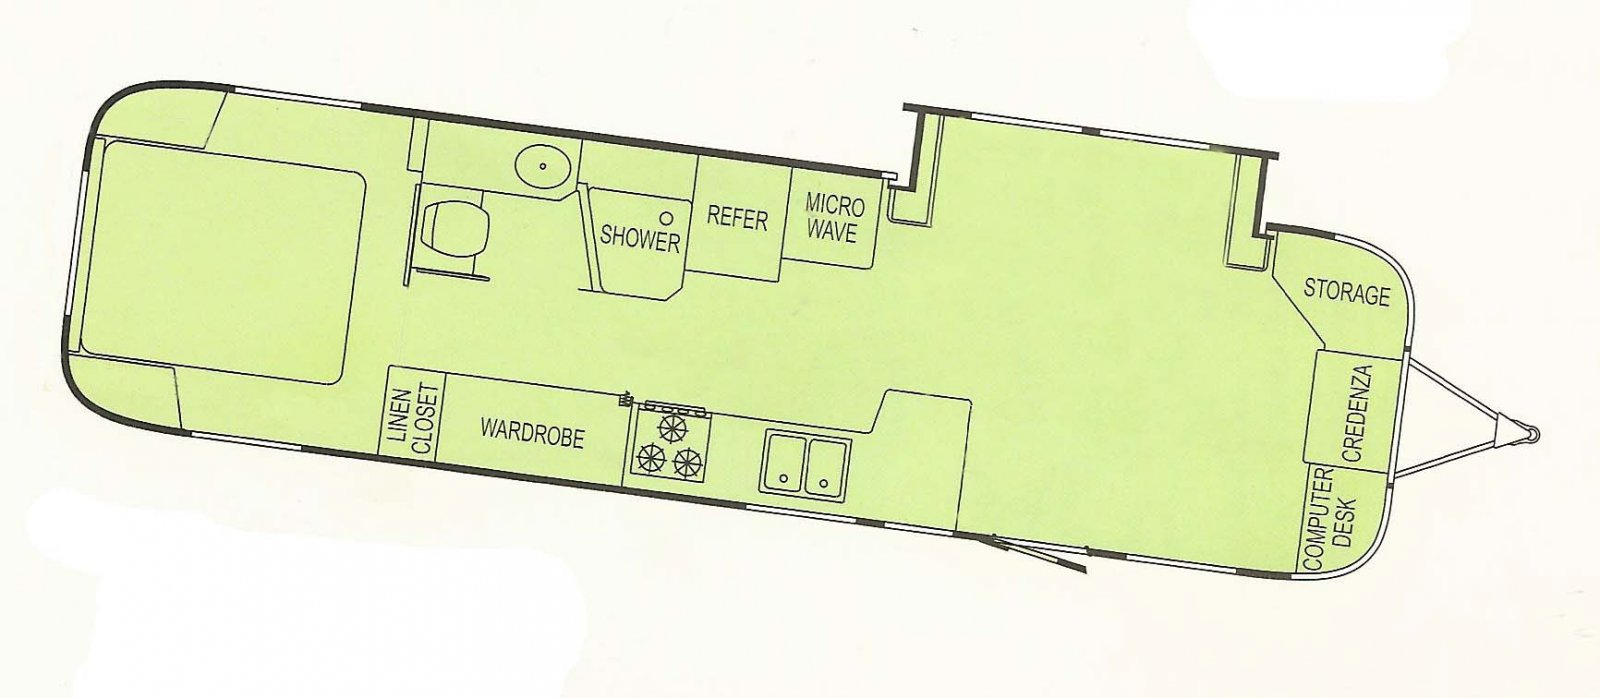 Click image for larger version  Name:34 Floorplan.jpg Views:161 Size:105.3 KB ID:233738